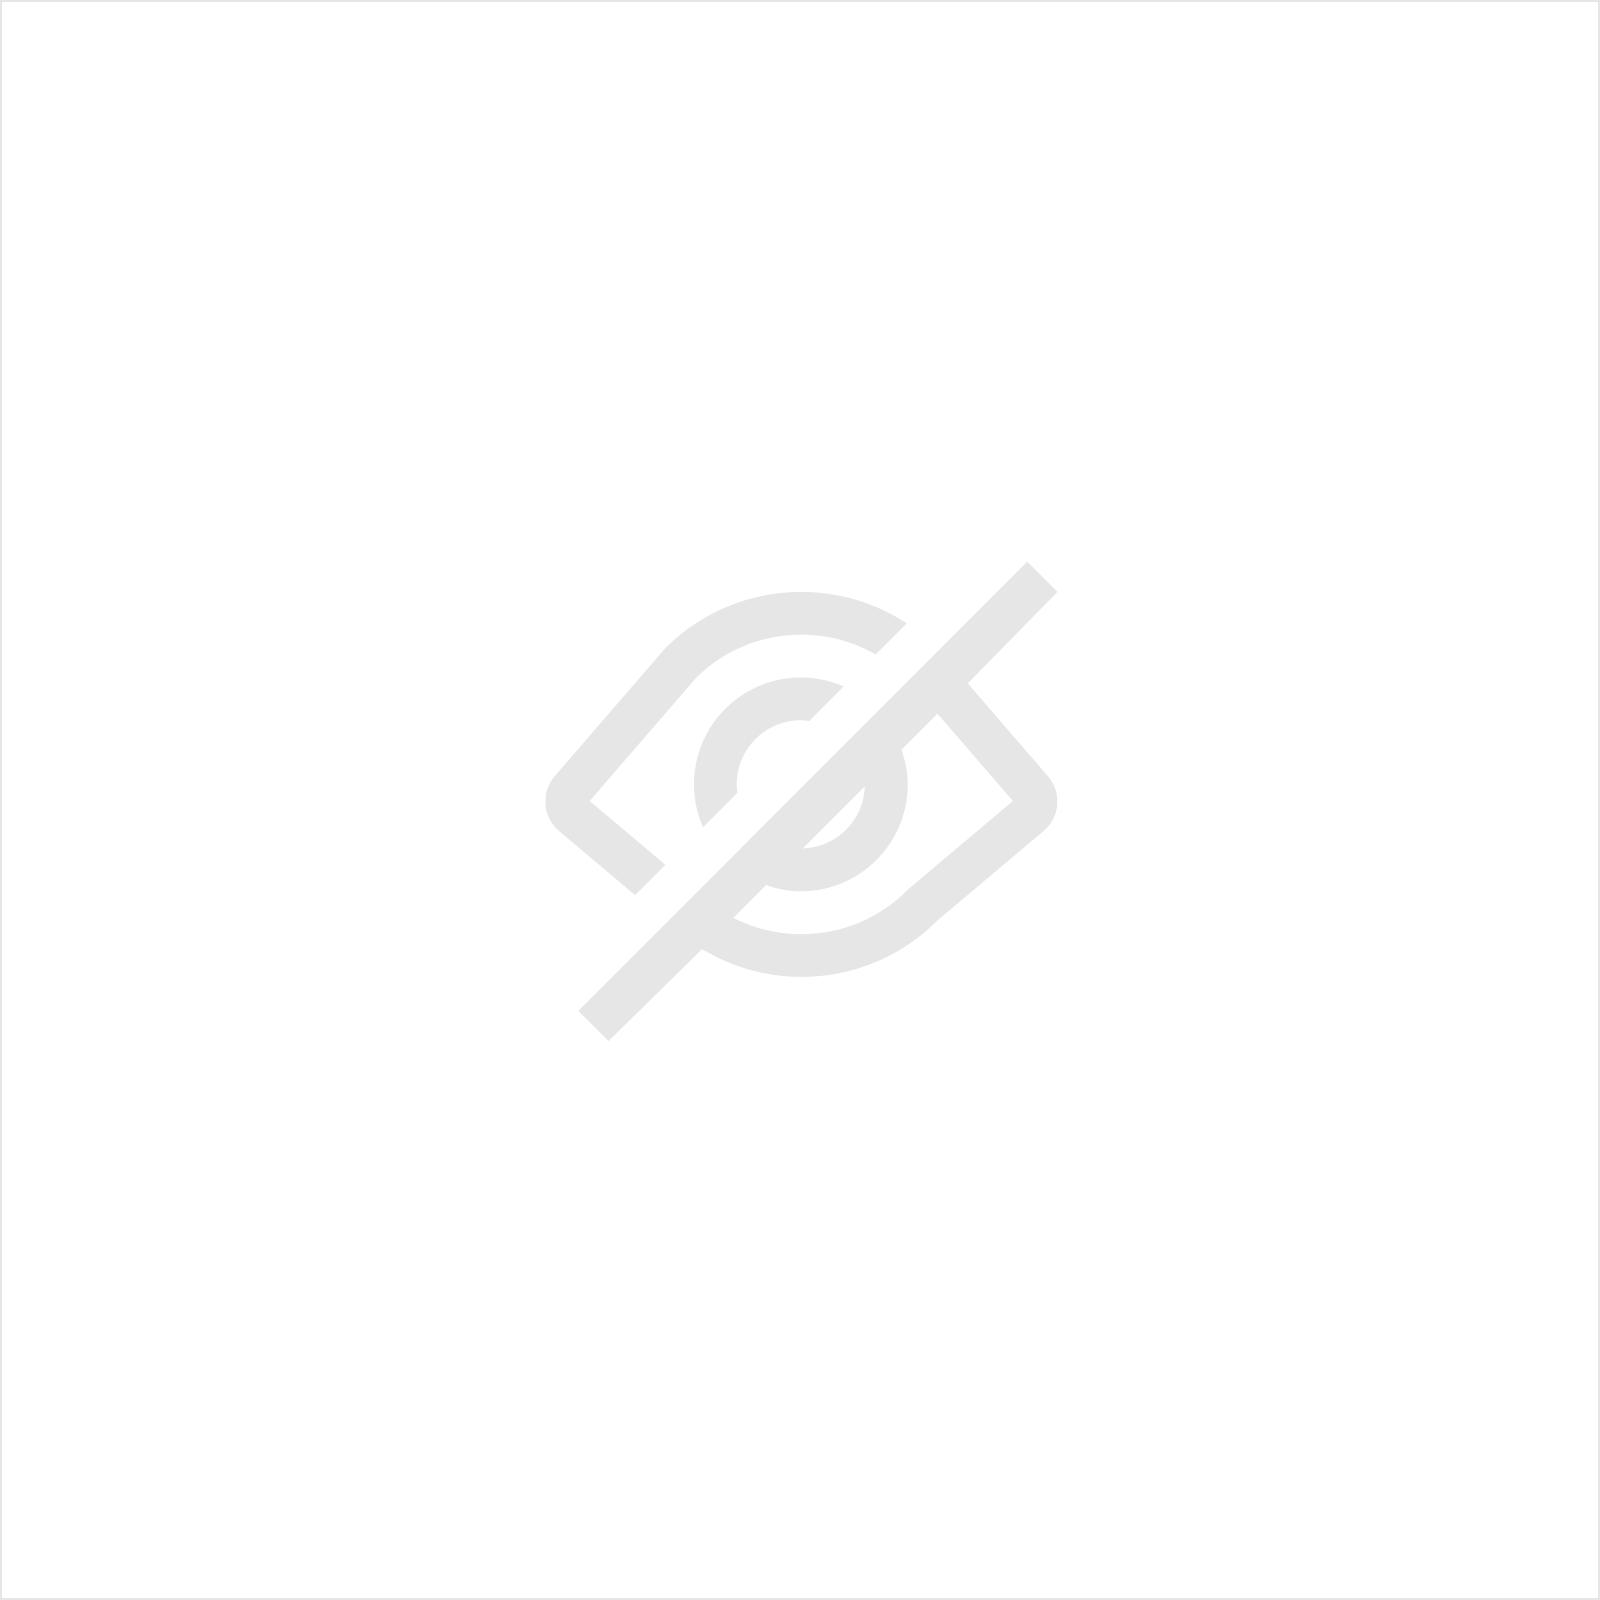 CLECO KLEM MET BEK 1/2   (12,7 mm) - 10 stuks